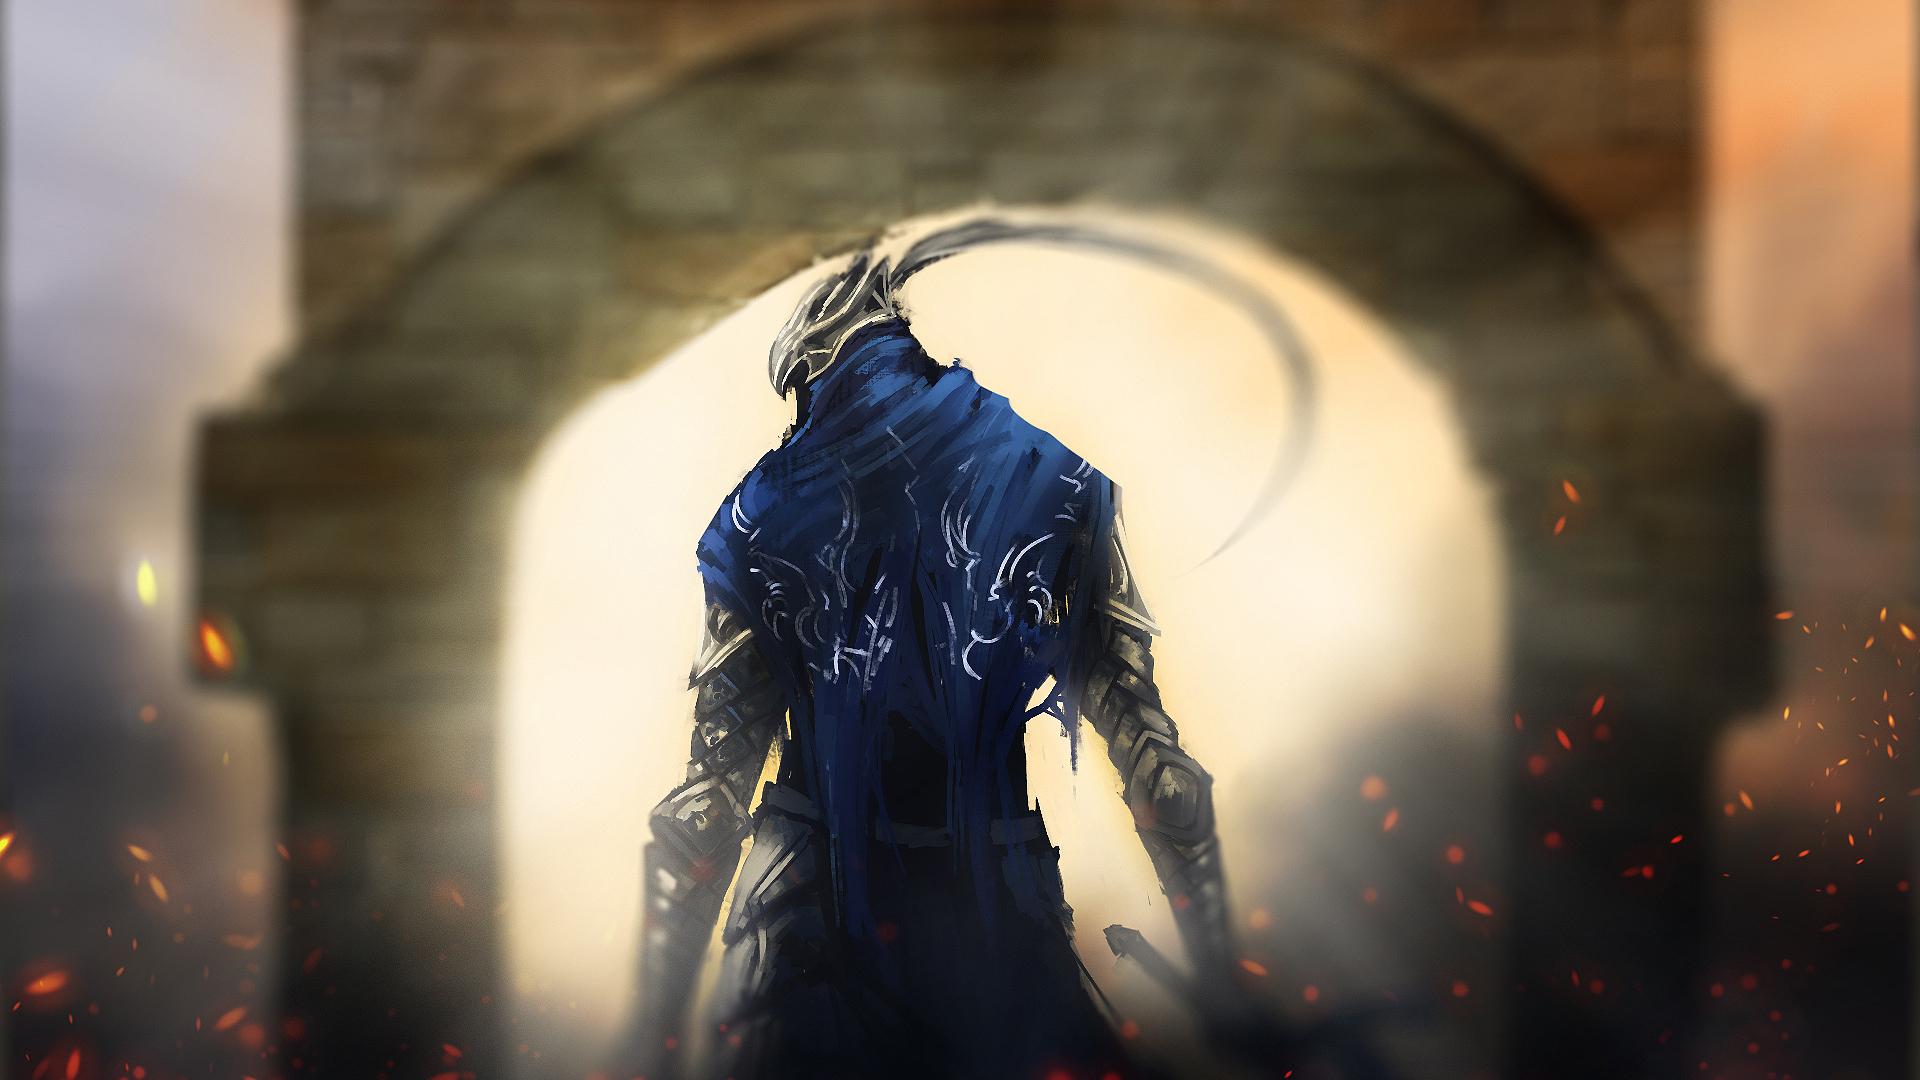 1920x1080 Dark Souls Gates Knight 1080p Laptop Full Hd